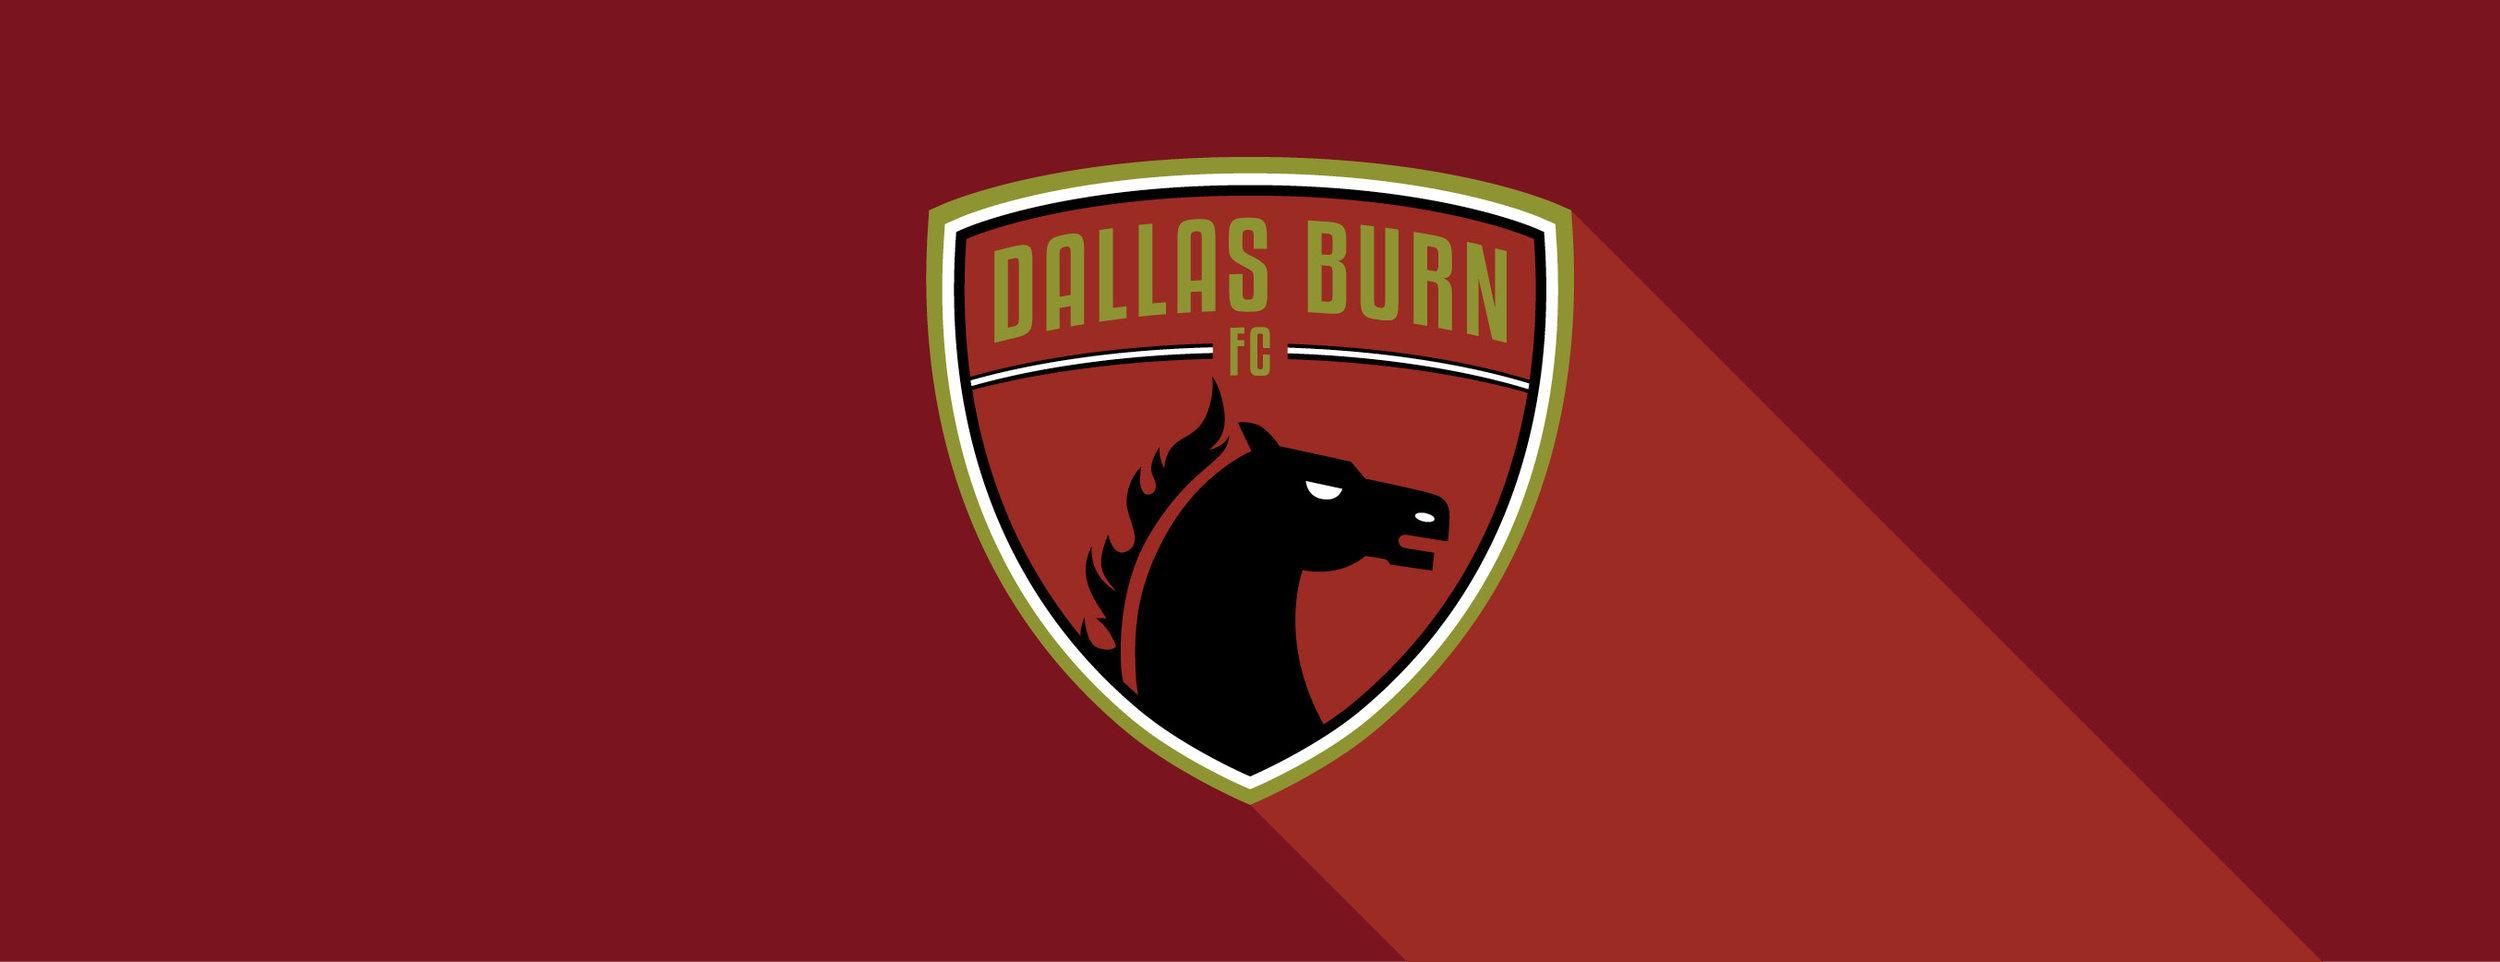 Dallas Burn FC.jpg